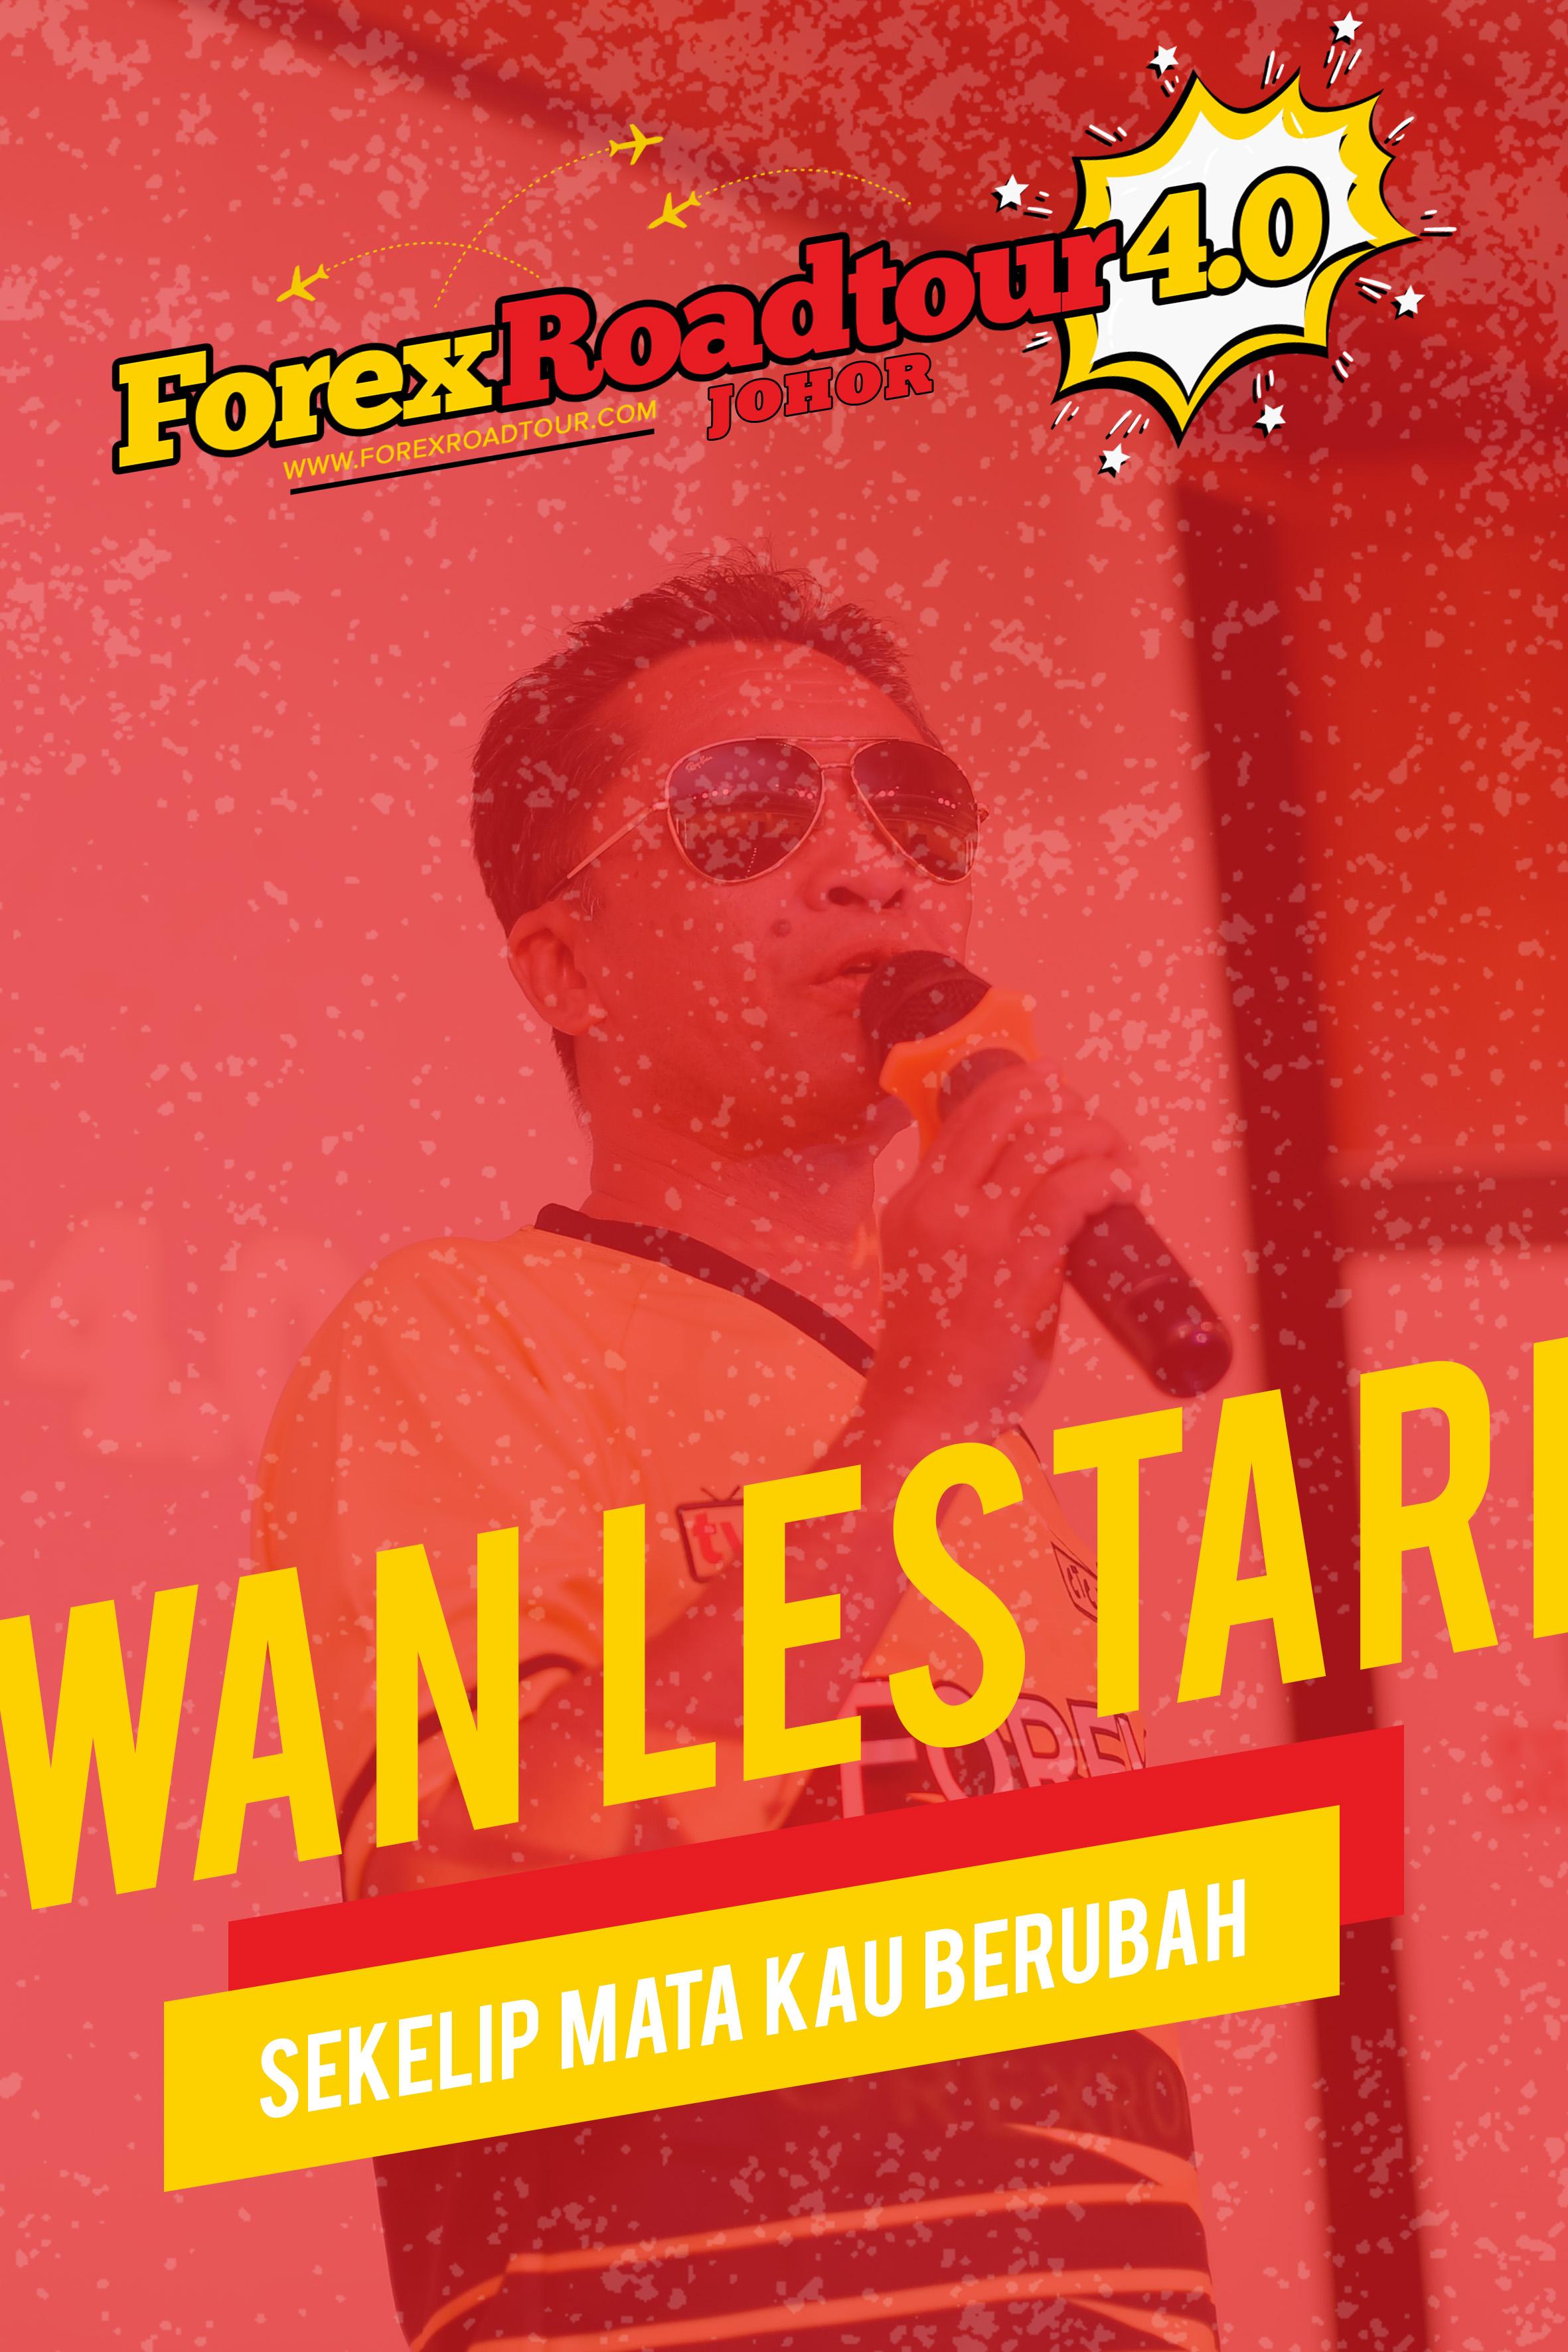 Wan Lestari - Sekelip Mata Kau Berubah [Forex Roadtour 4.0 Johor]